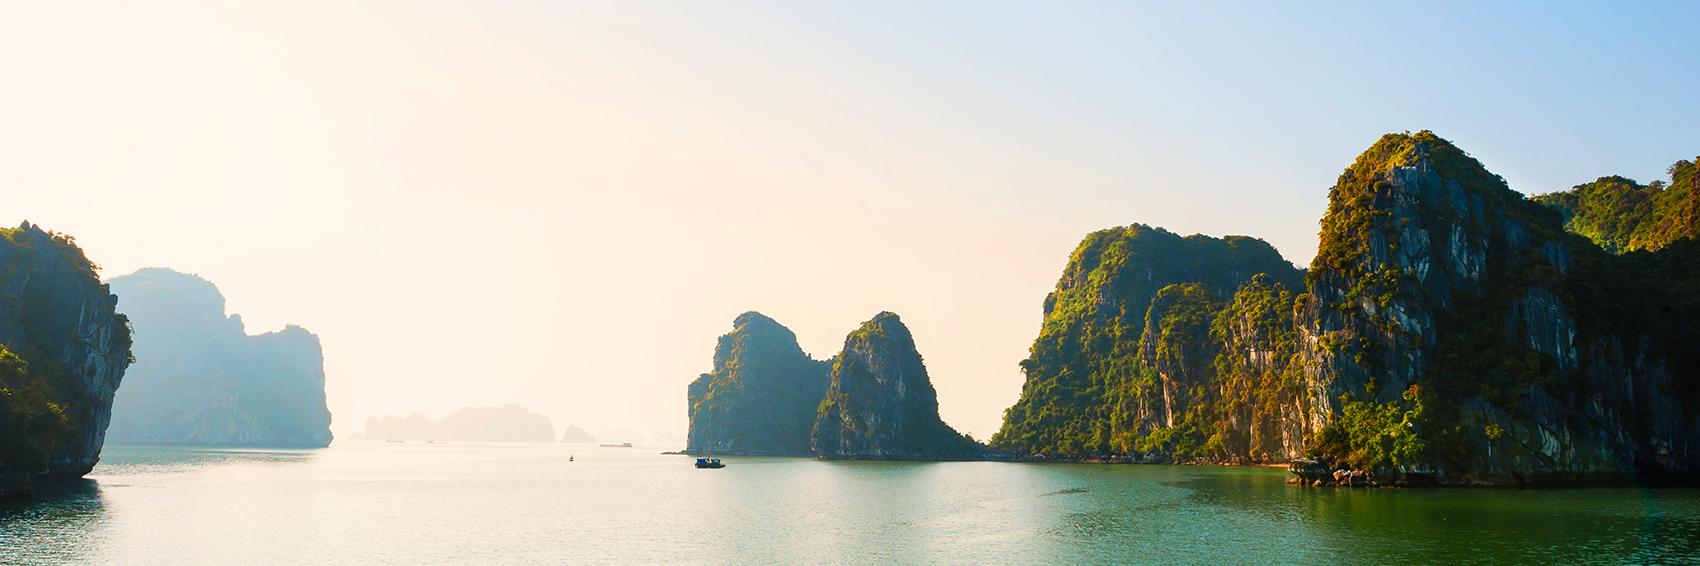 Jonque Indochina Sails - Baie d'Halong